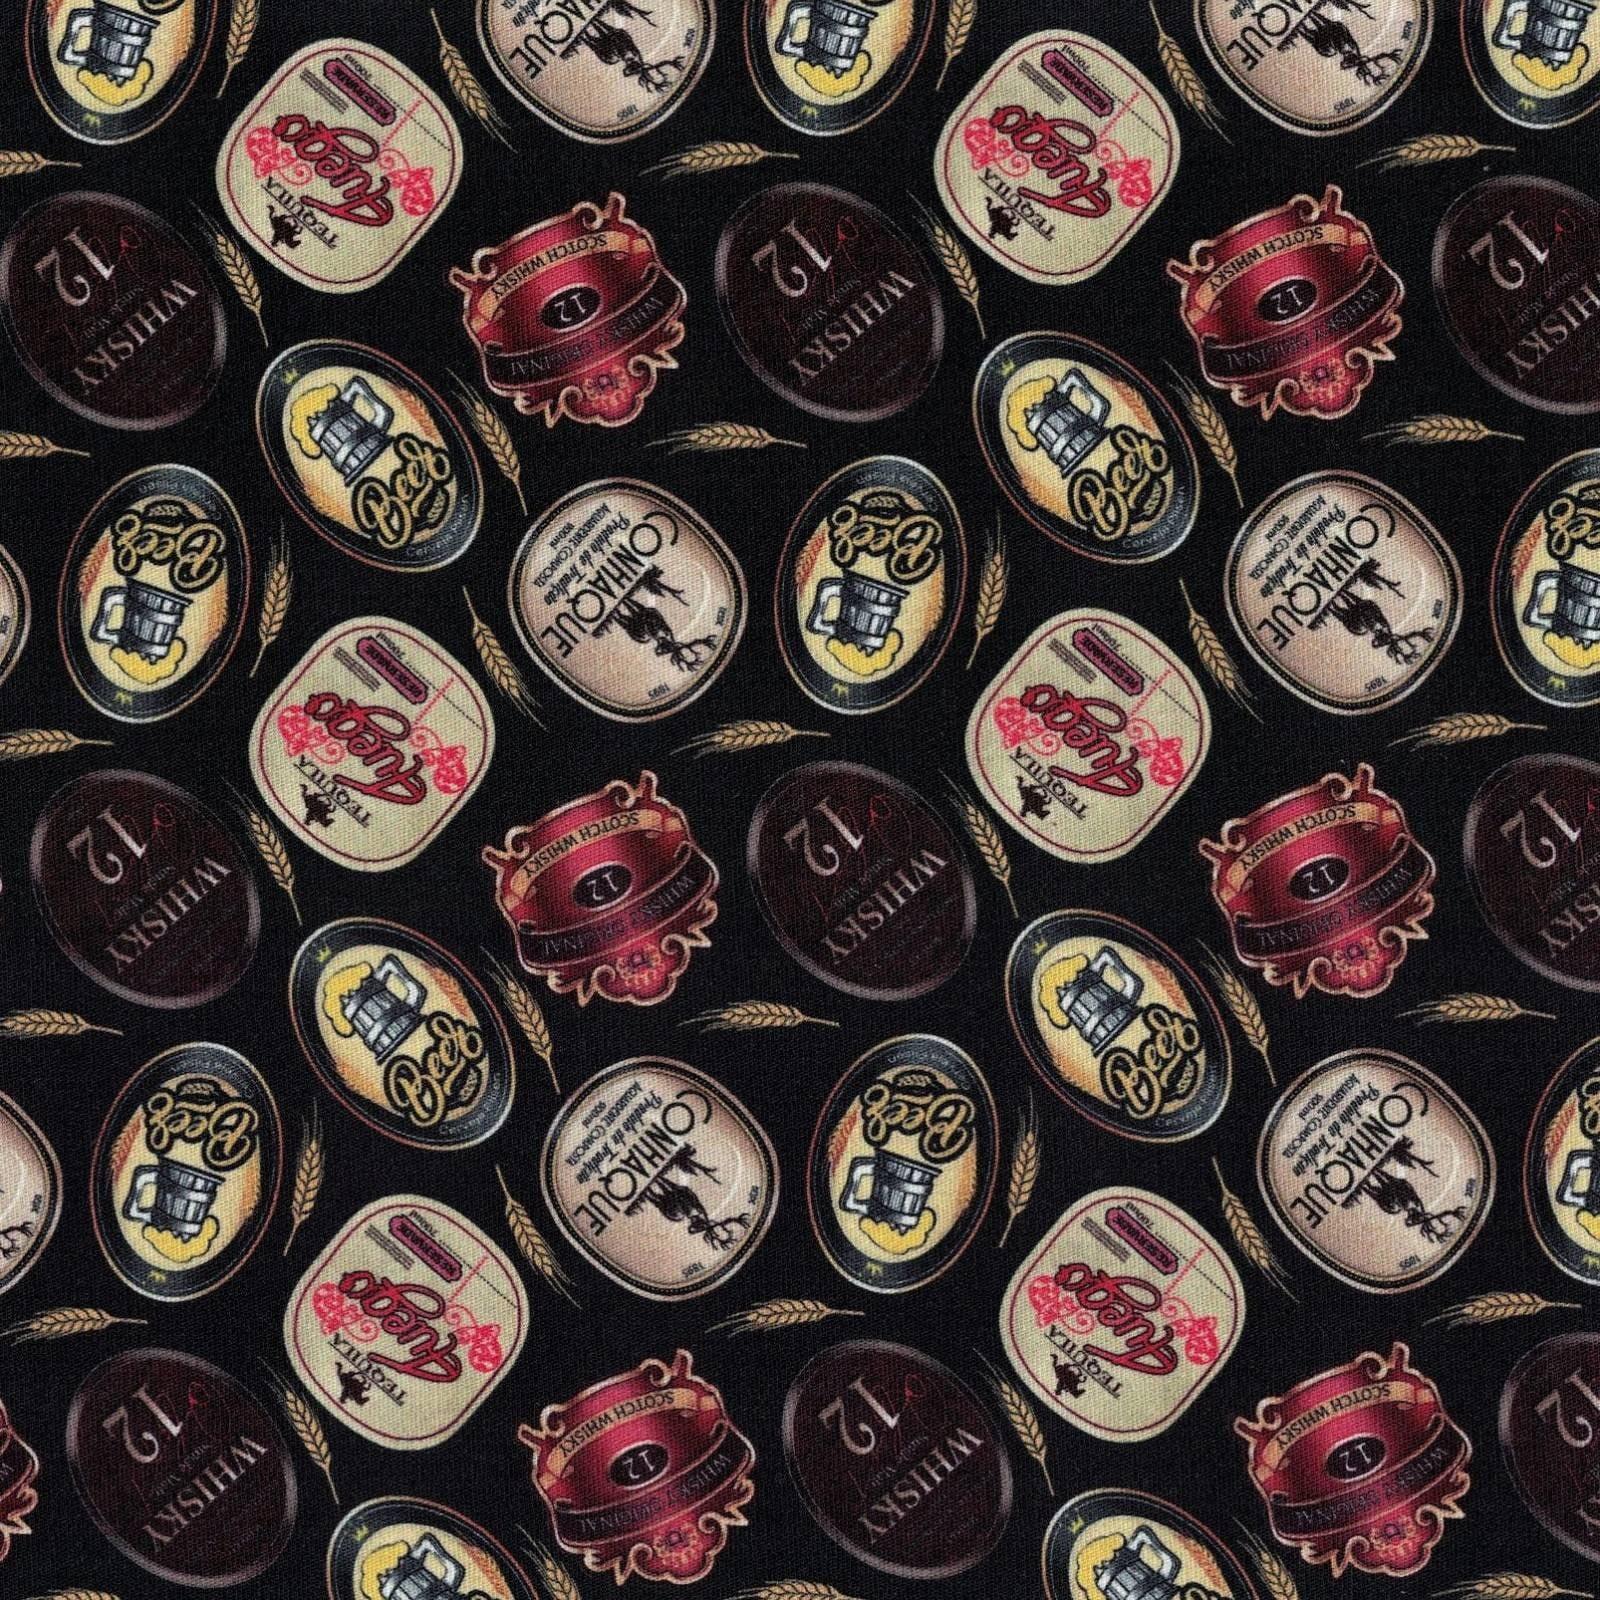 Tecido Tricoline Digital Estampado Rótulos de Bebidas - Fundo Preto - Preço de 50 cm x 150 cm